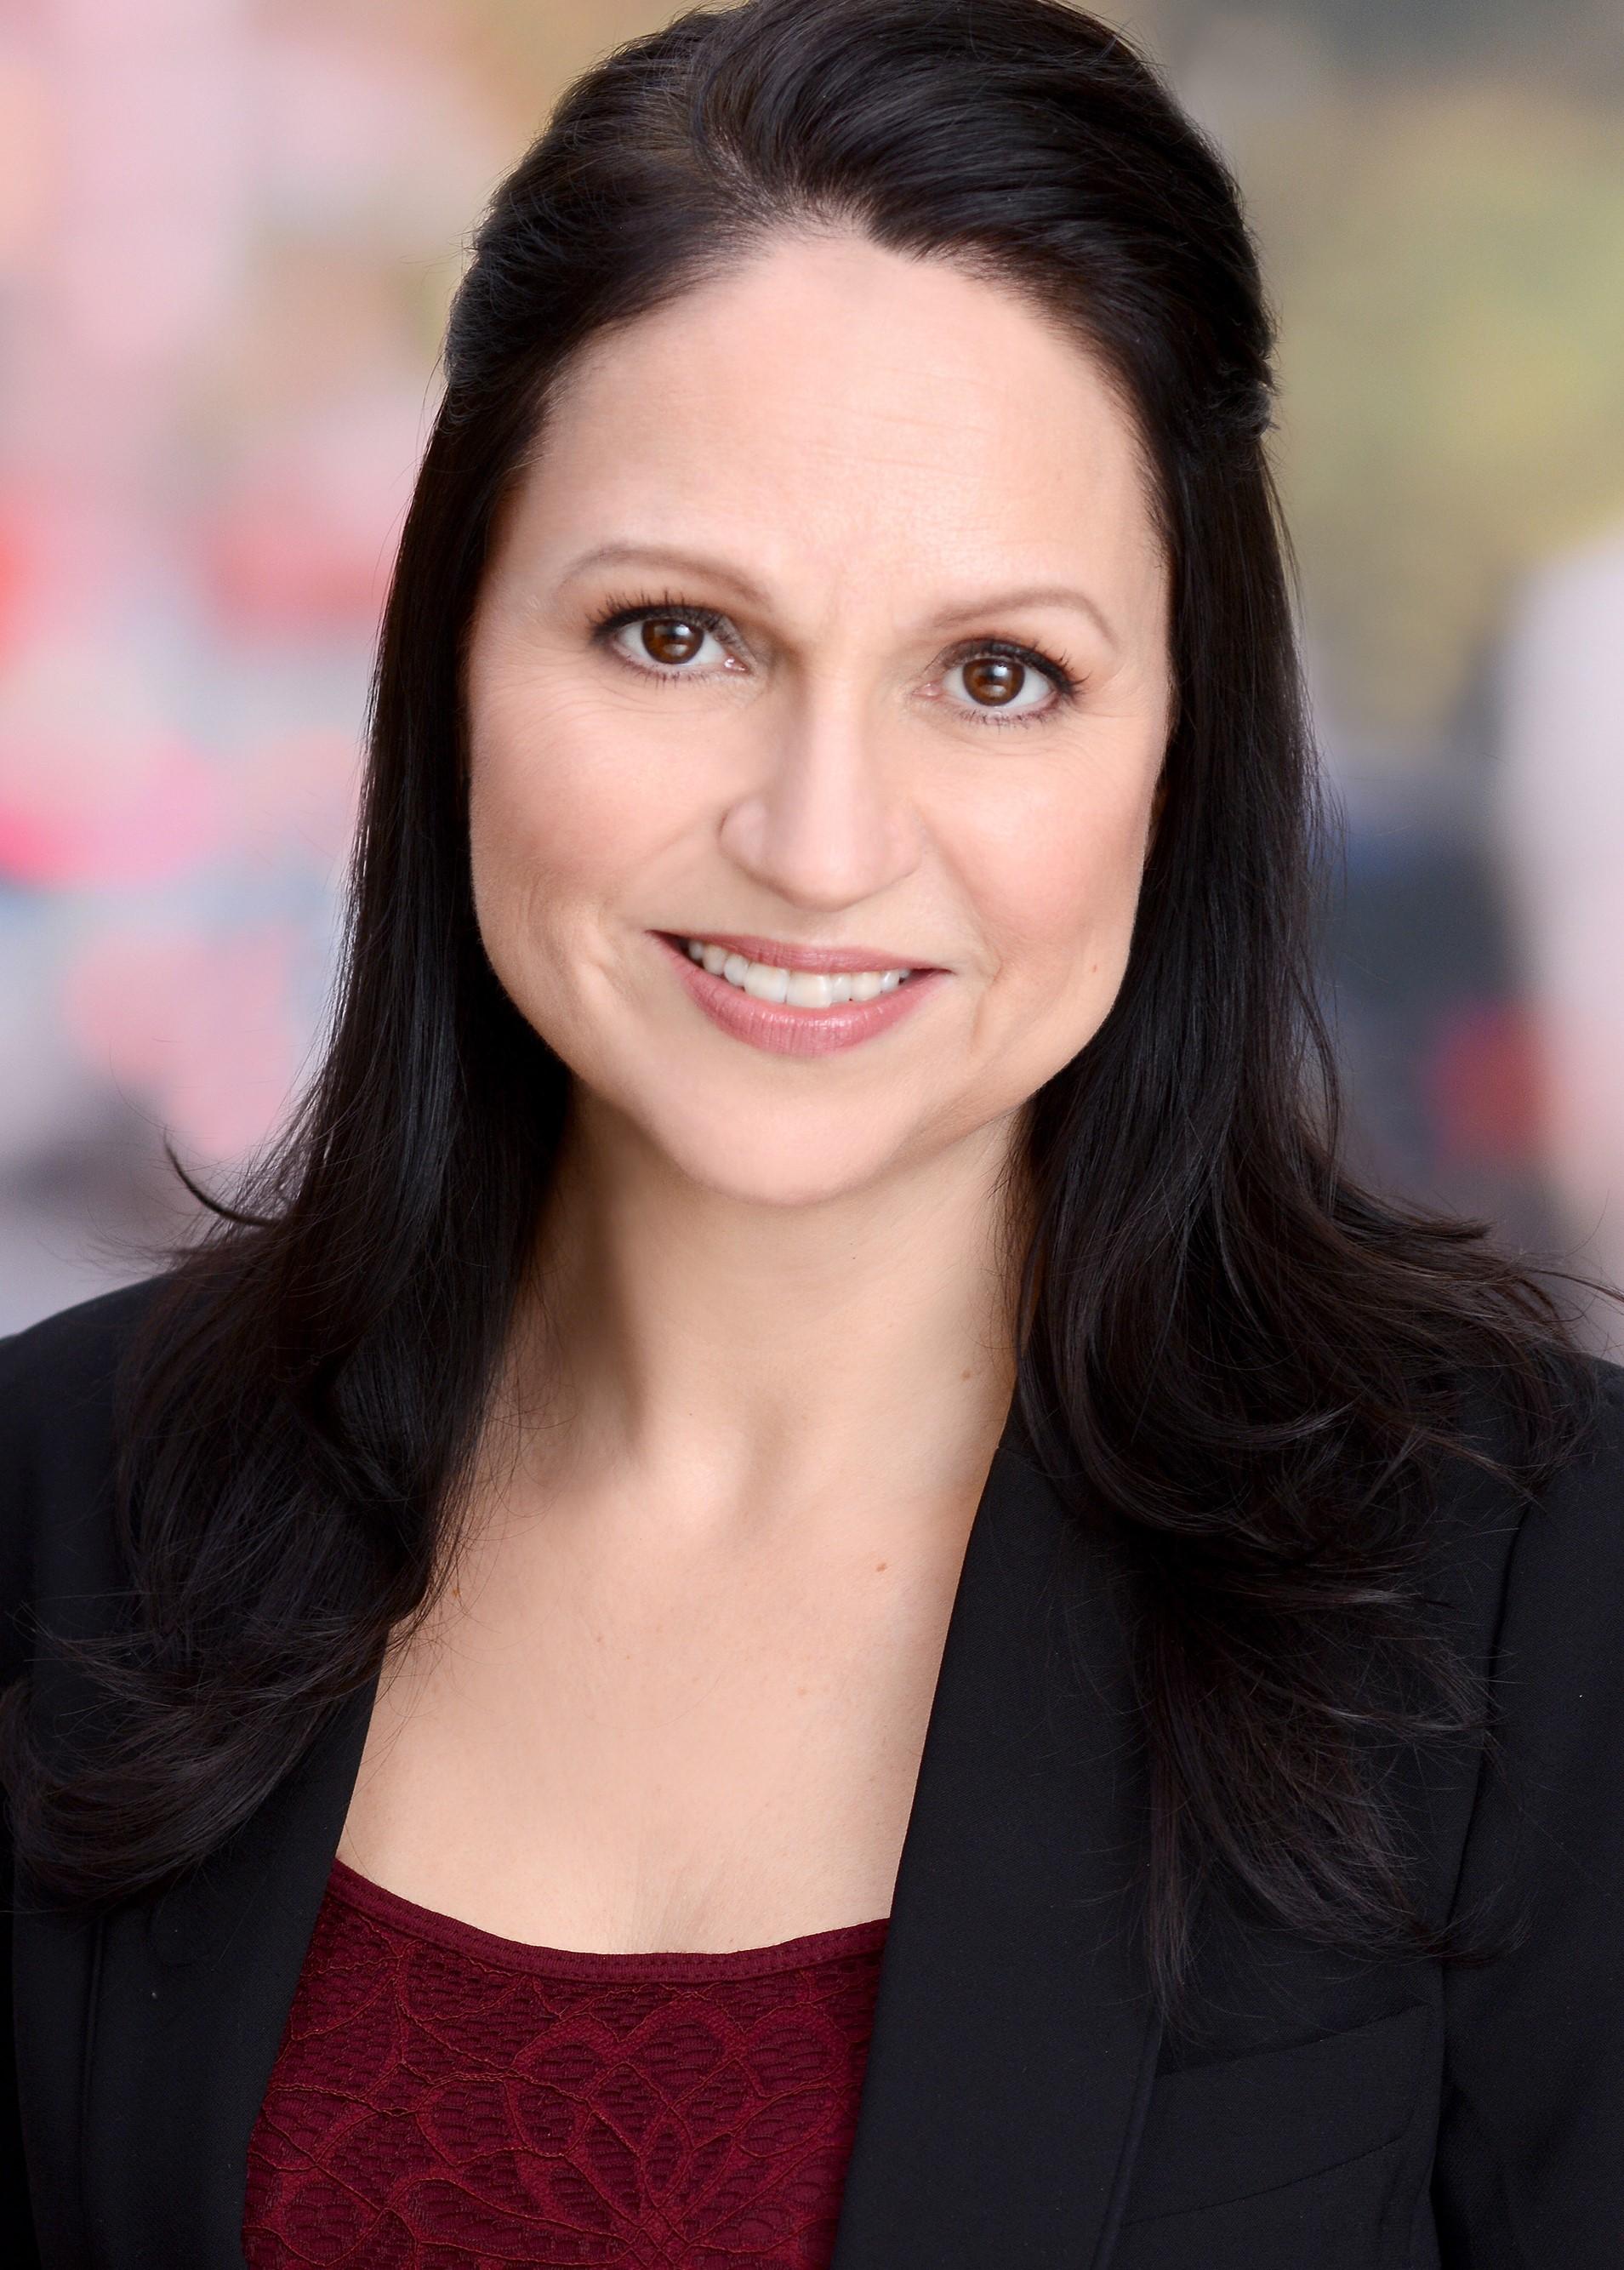 Susan Rybin